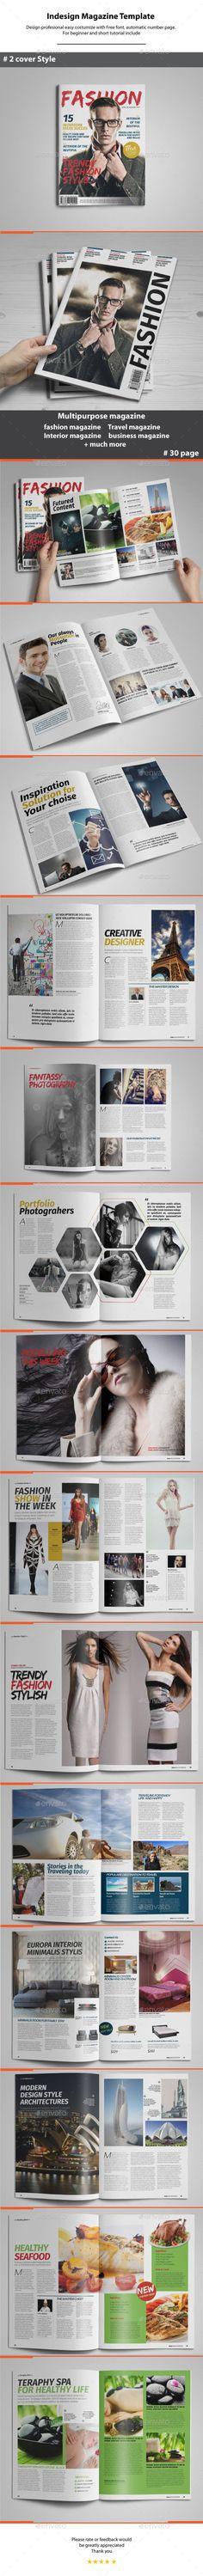 Indesign Magazine Template #design #journal Download: http://graphicriver.net/item/indesign-magazine-template/11421618?ref=ksioks